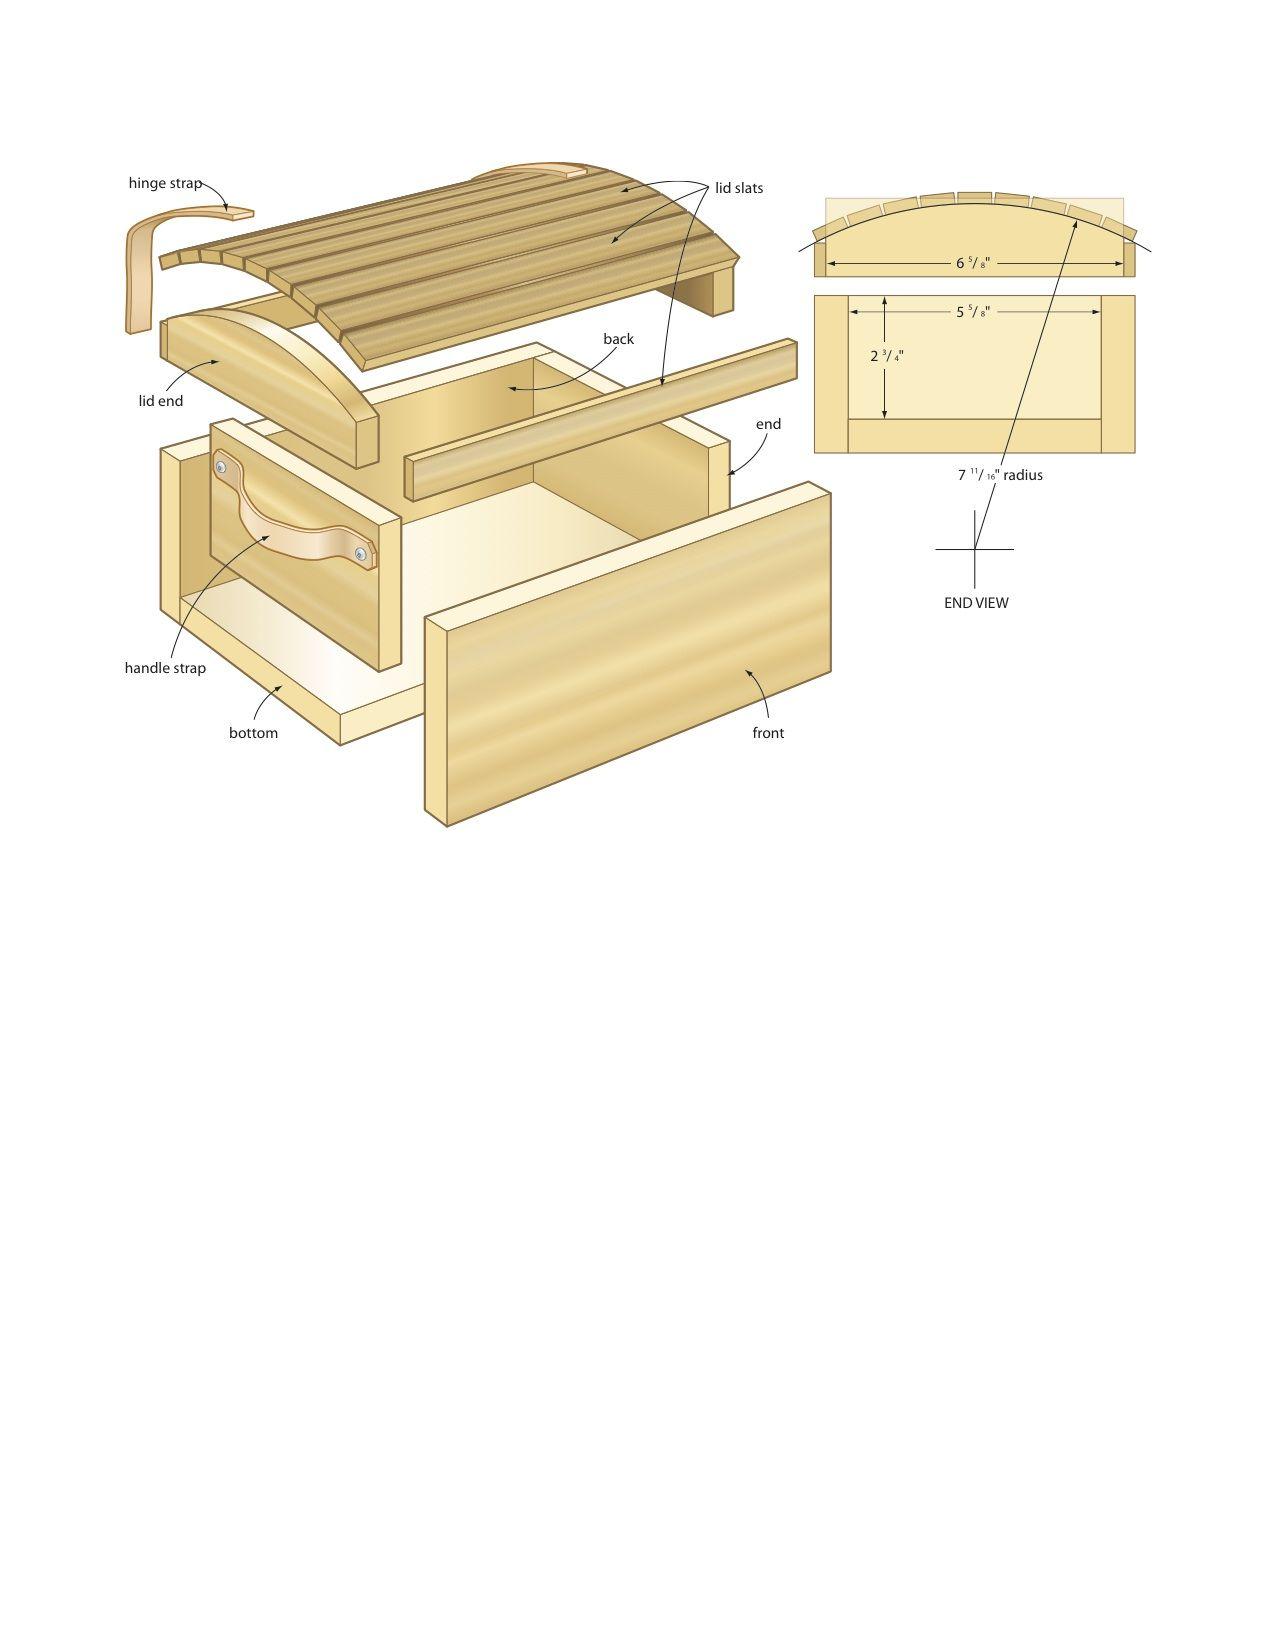 Wooden pirates chest plans diy blueprints pirates chest for Box blueprint maker